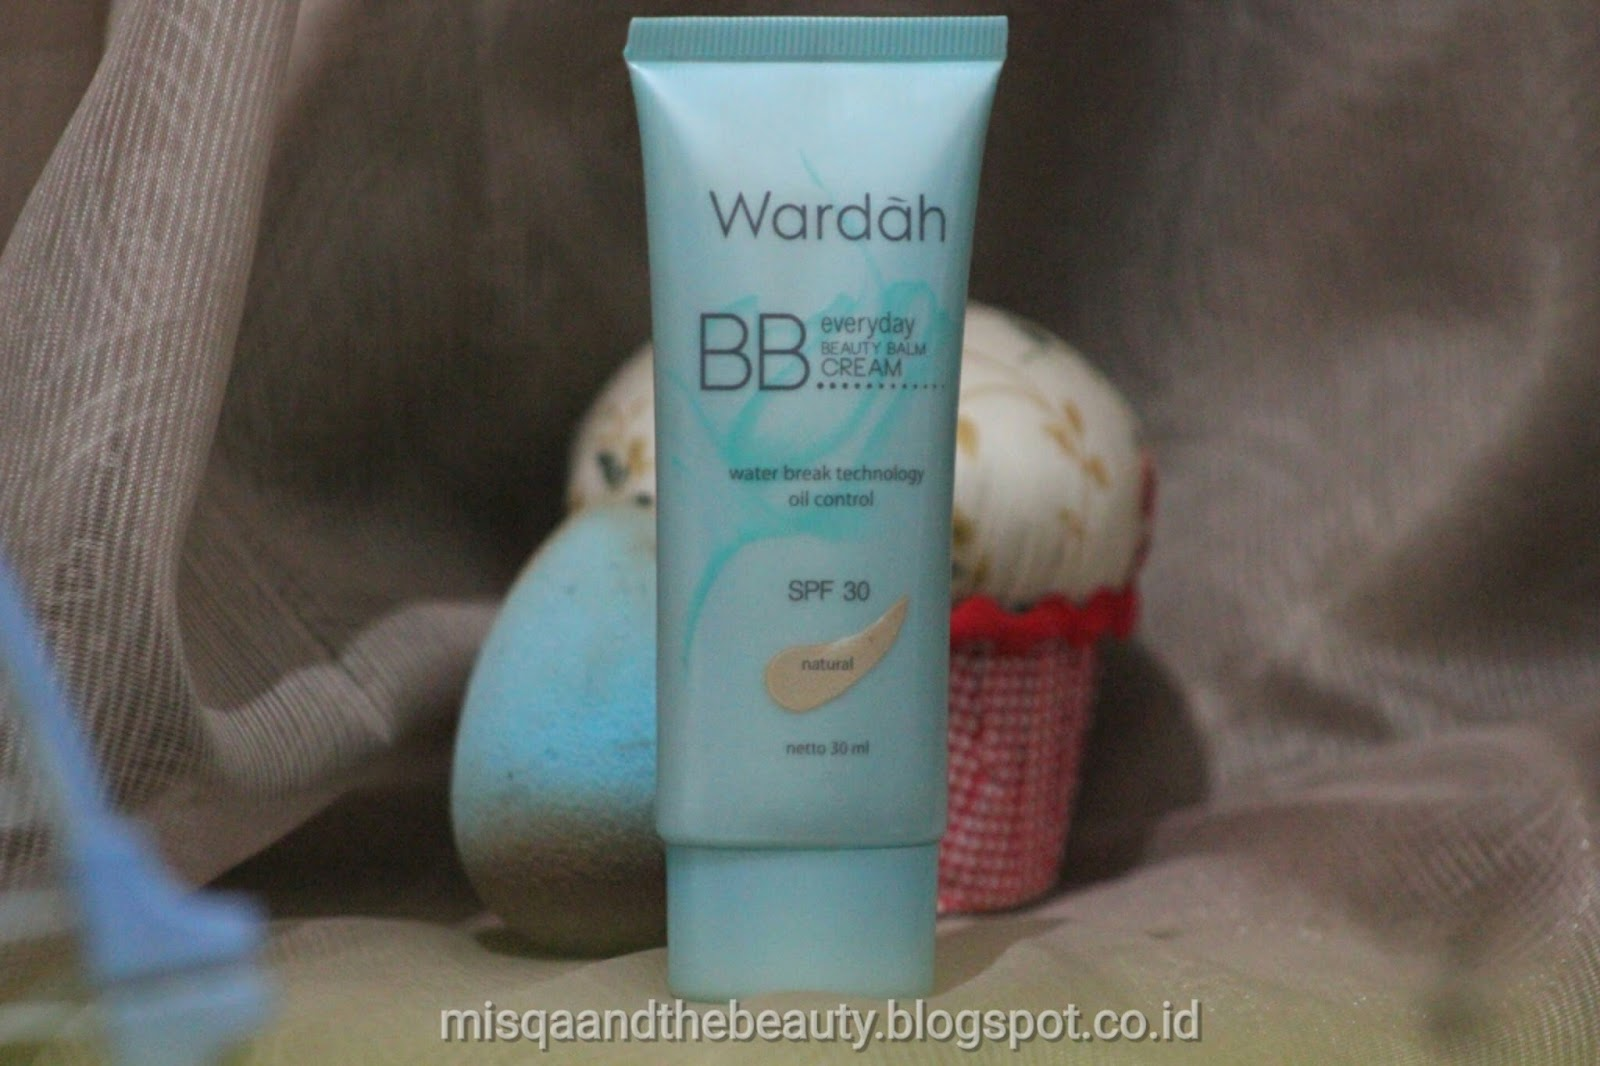 Misqa Beauty Journey Review Wardah Everyday Bb Cream Natural Asli Beneran Aku Suka Banget Ama Ini Udah Repurchase Yang Ketiga Bikin Muka Cerah Meratakan Warna Kulit Dan Mengontrol Minyak Di